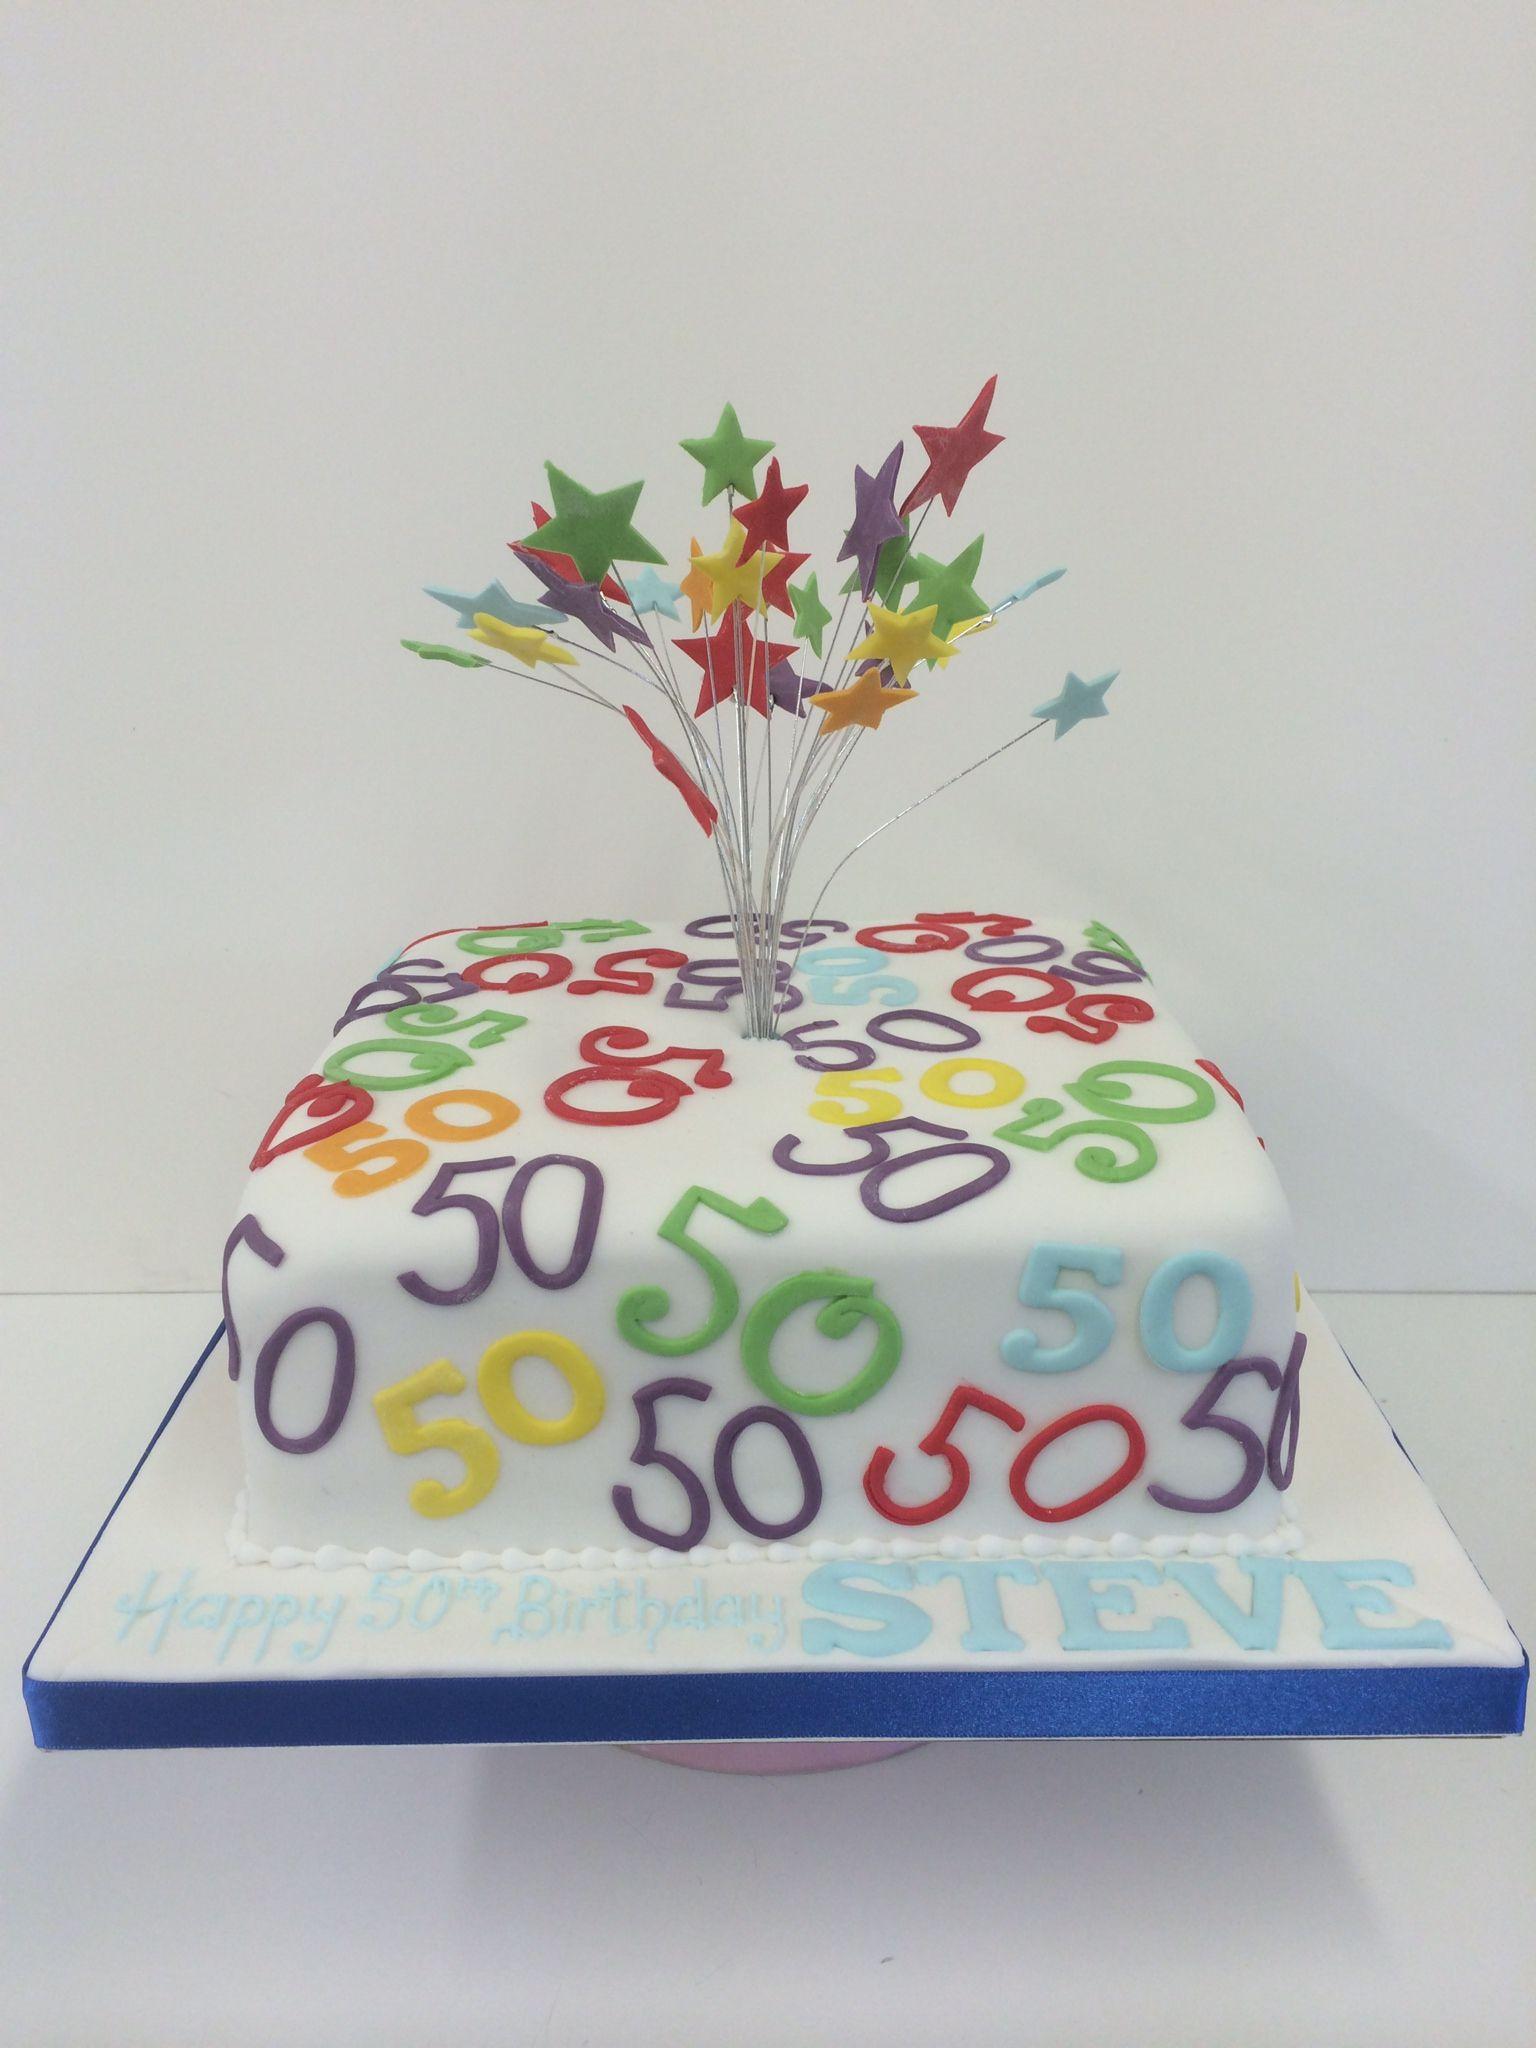 50Th Birthday Cakes Women For Celebrations Cake Ideas Pinterest